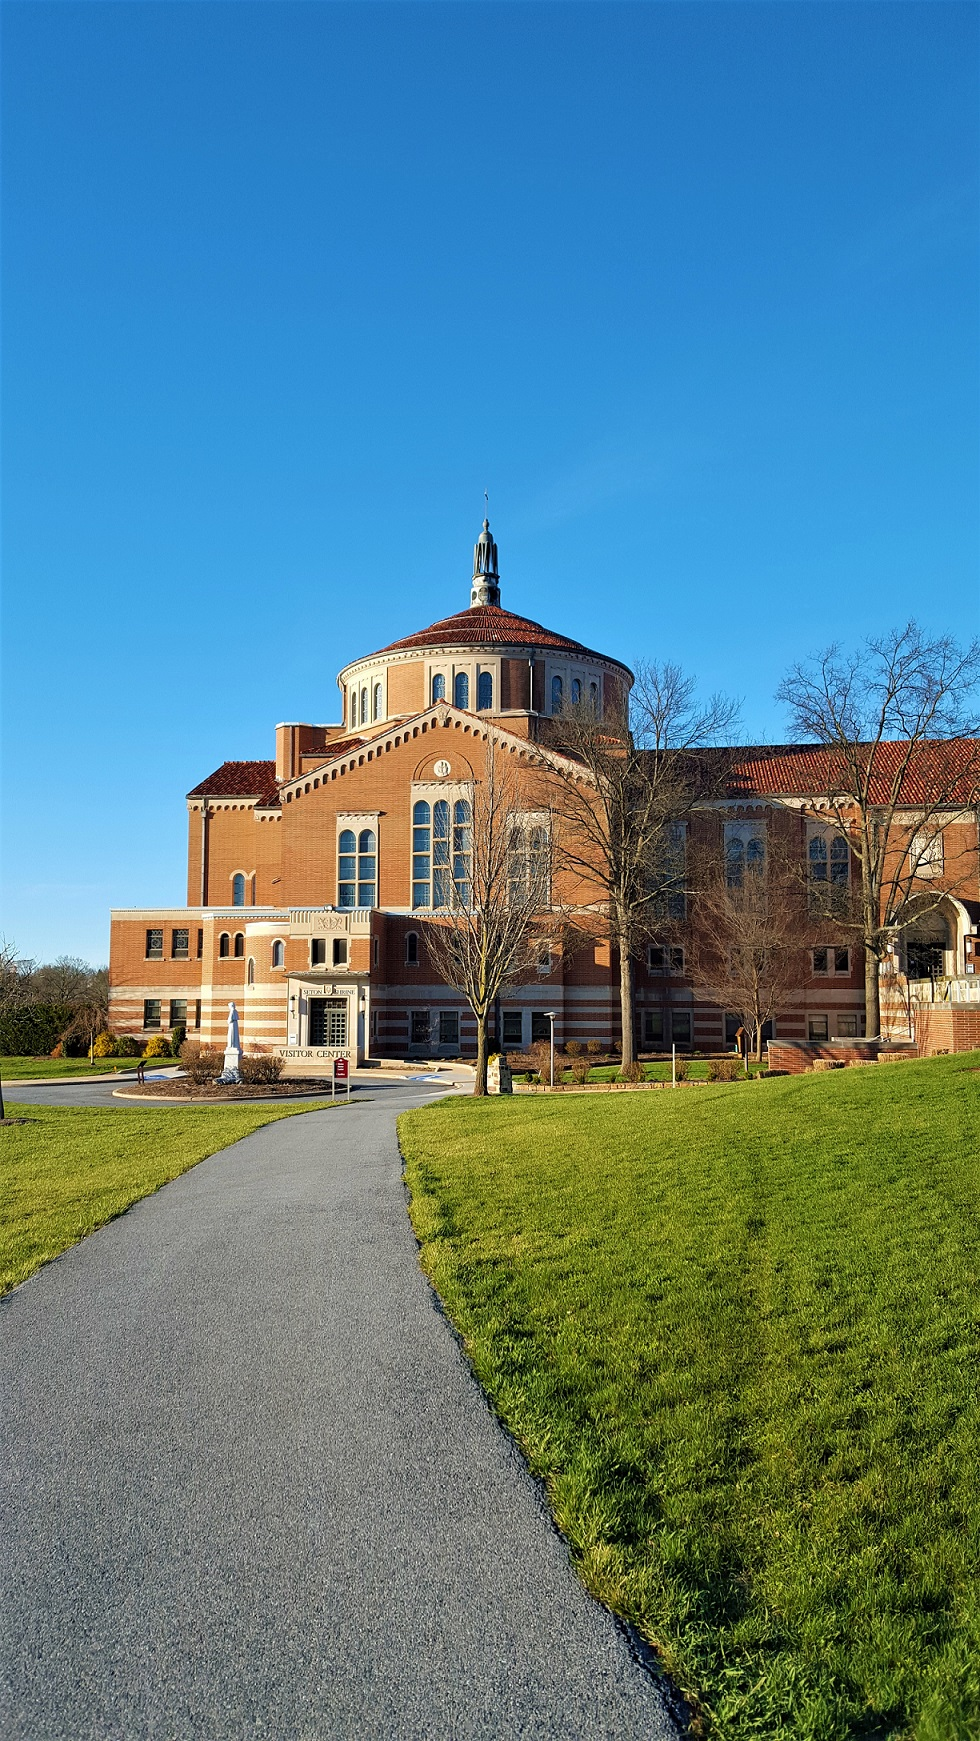 National Shrine of Saint Elizabeth Ann Seton